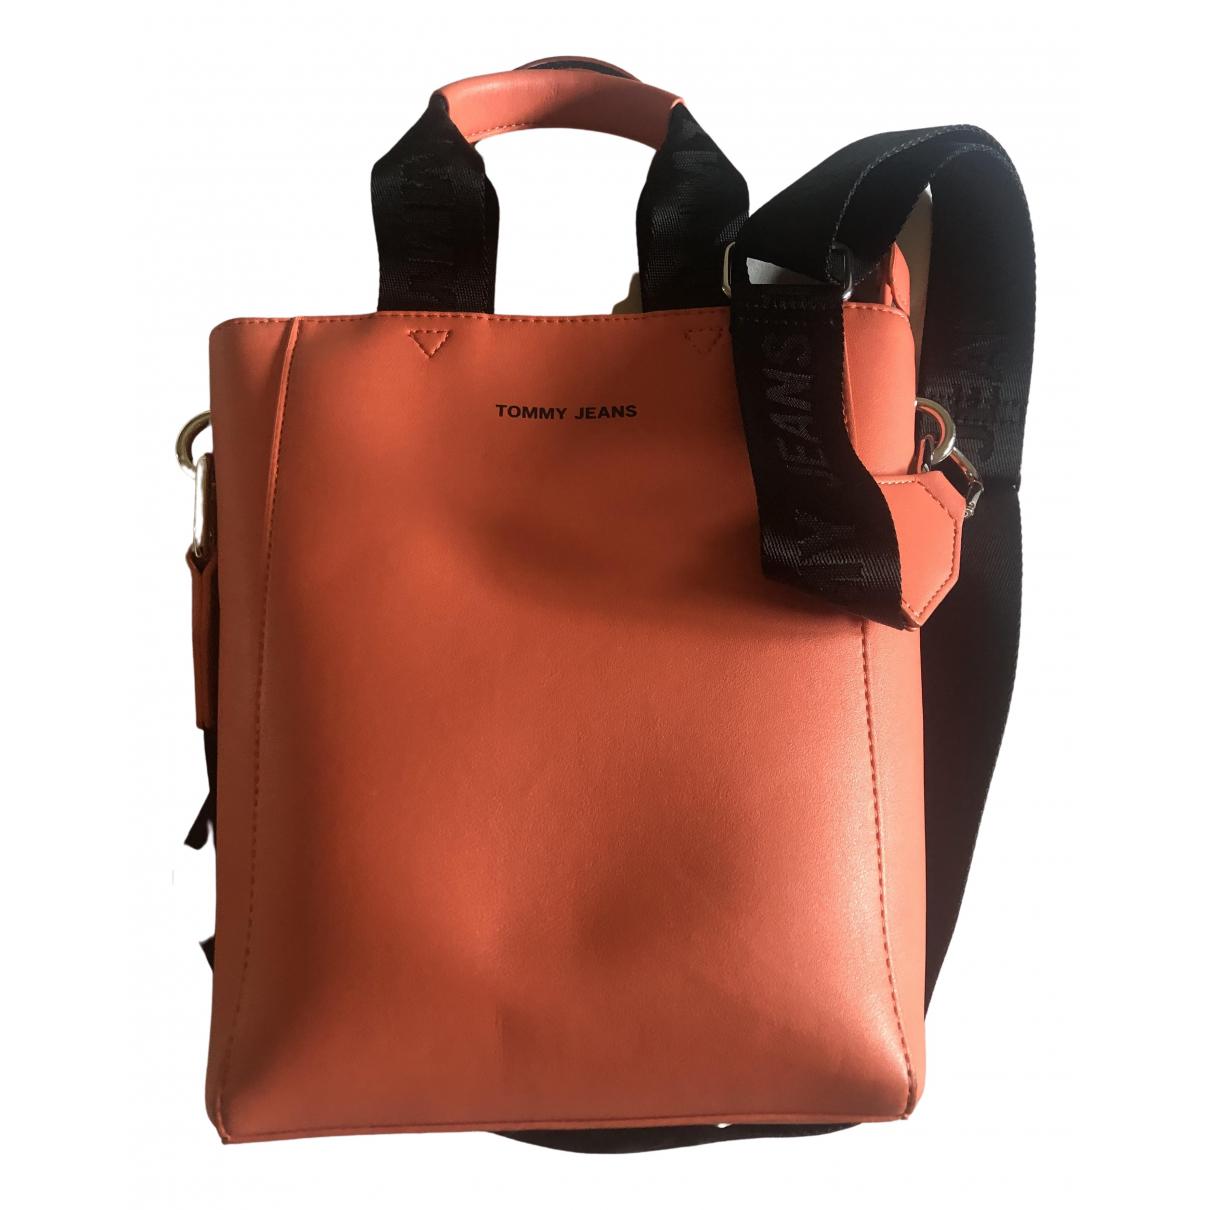 Tommy Jeans \N Orange handbag for Women \N